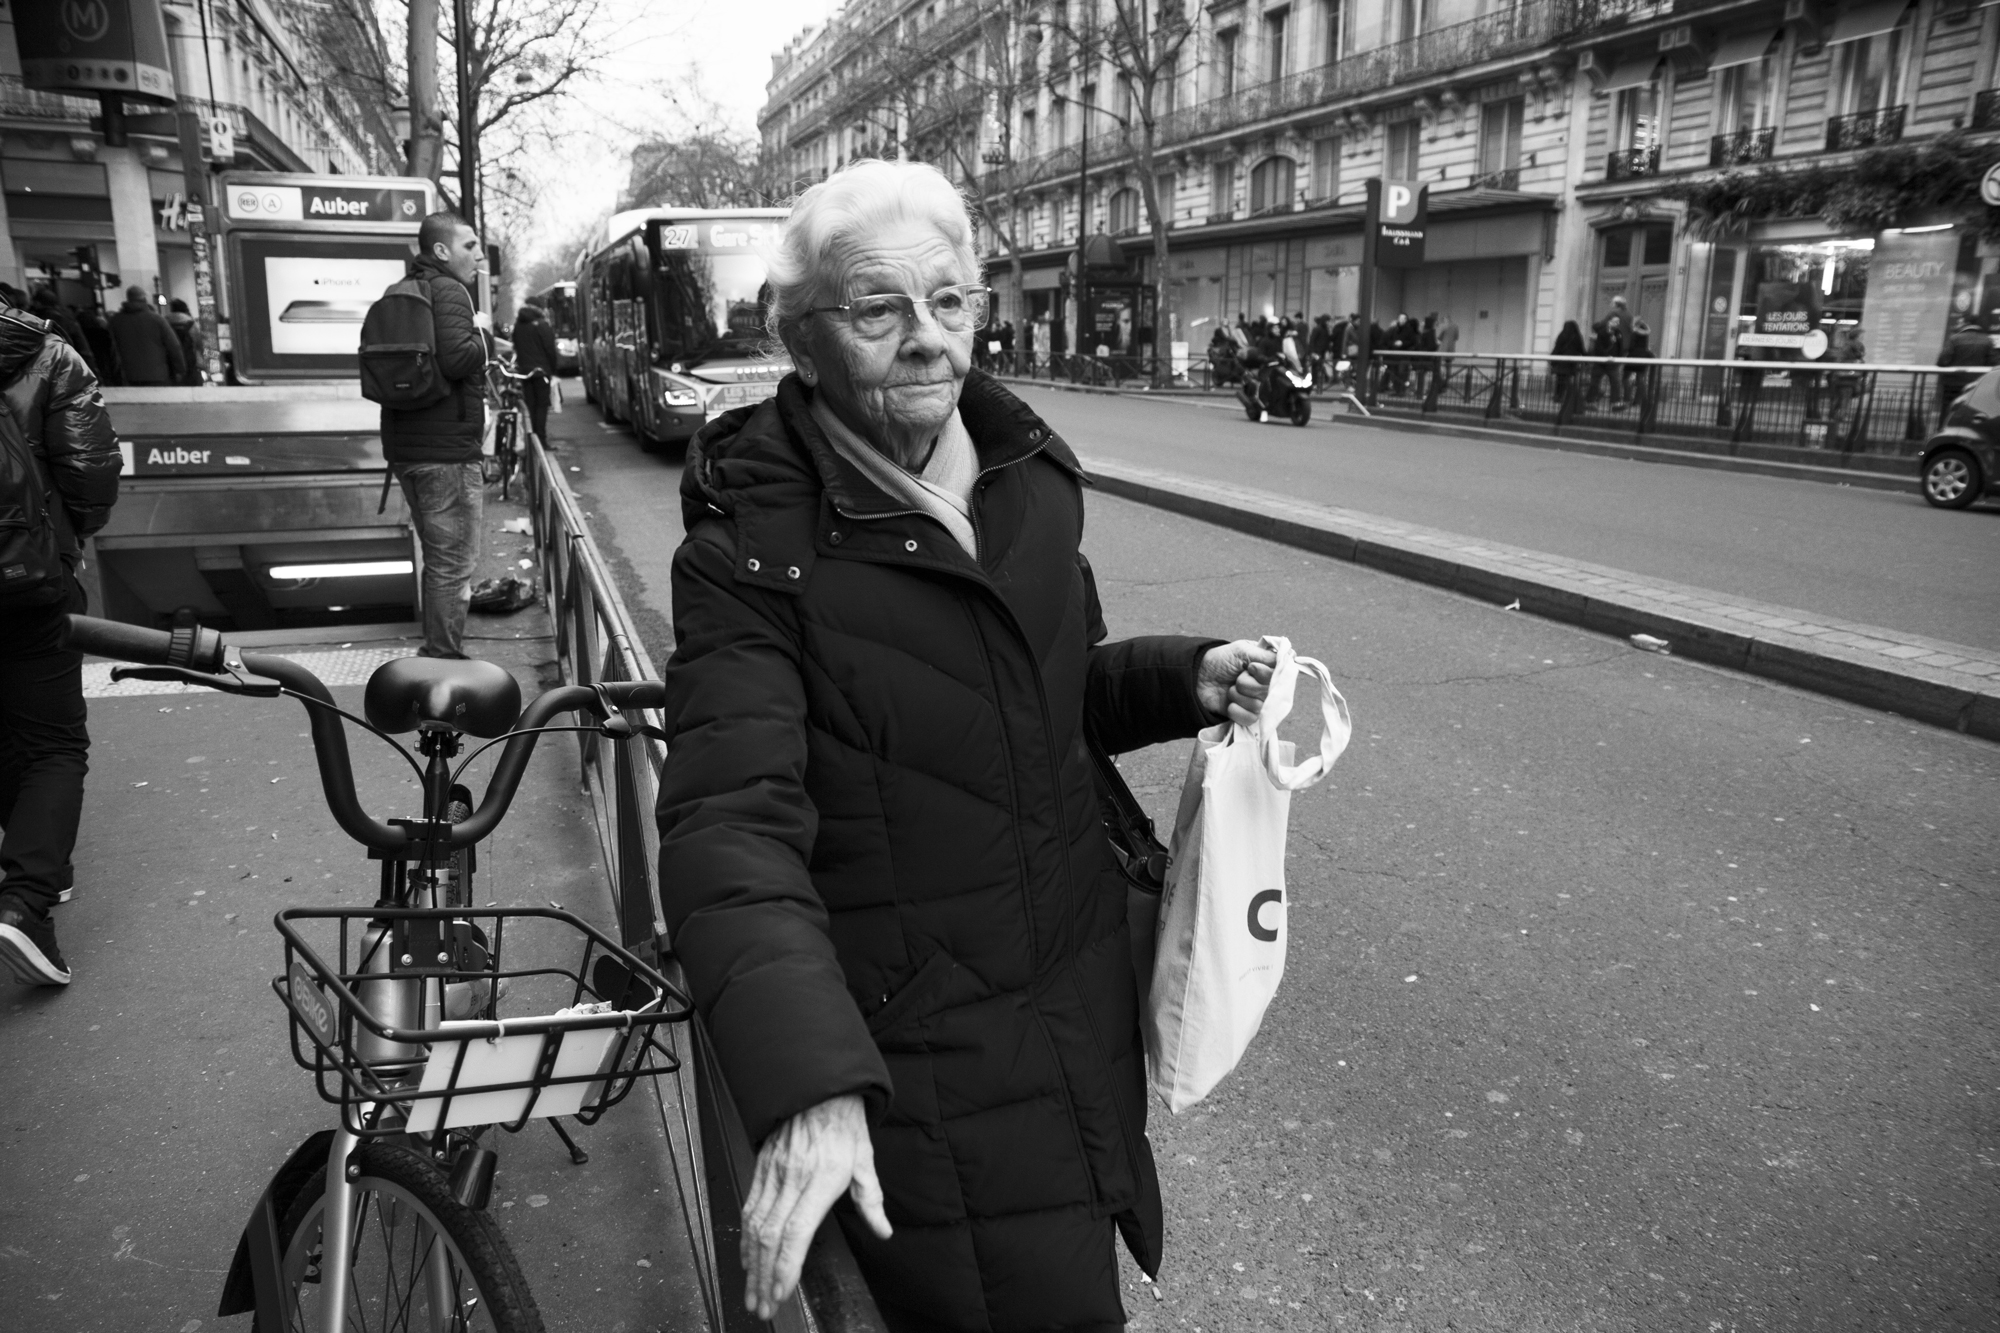 """Never stop"" - Boulevard Haussman, Paris (2018). © Clémence Rougetet"